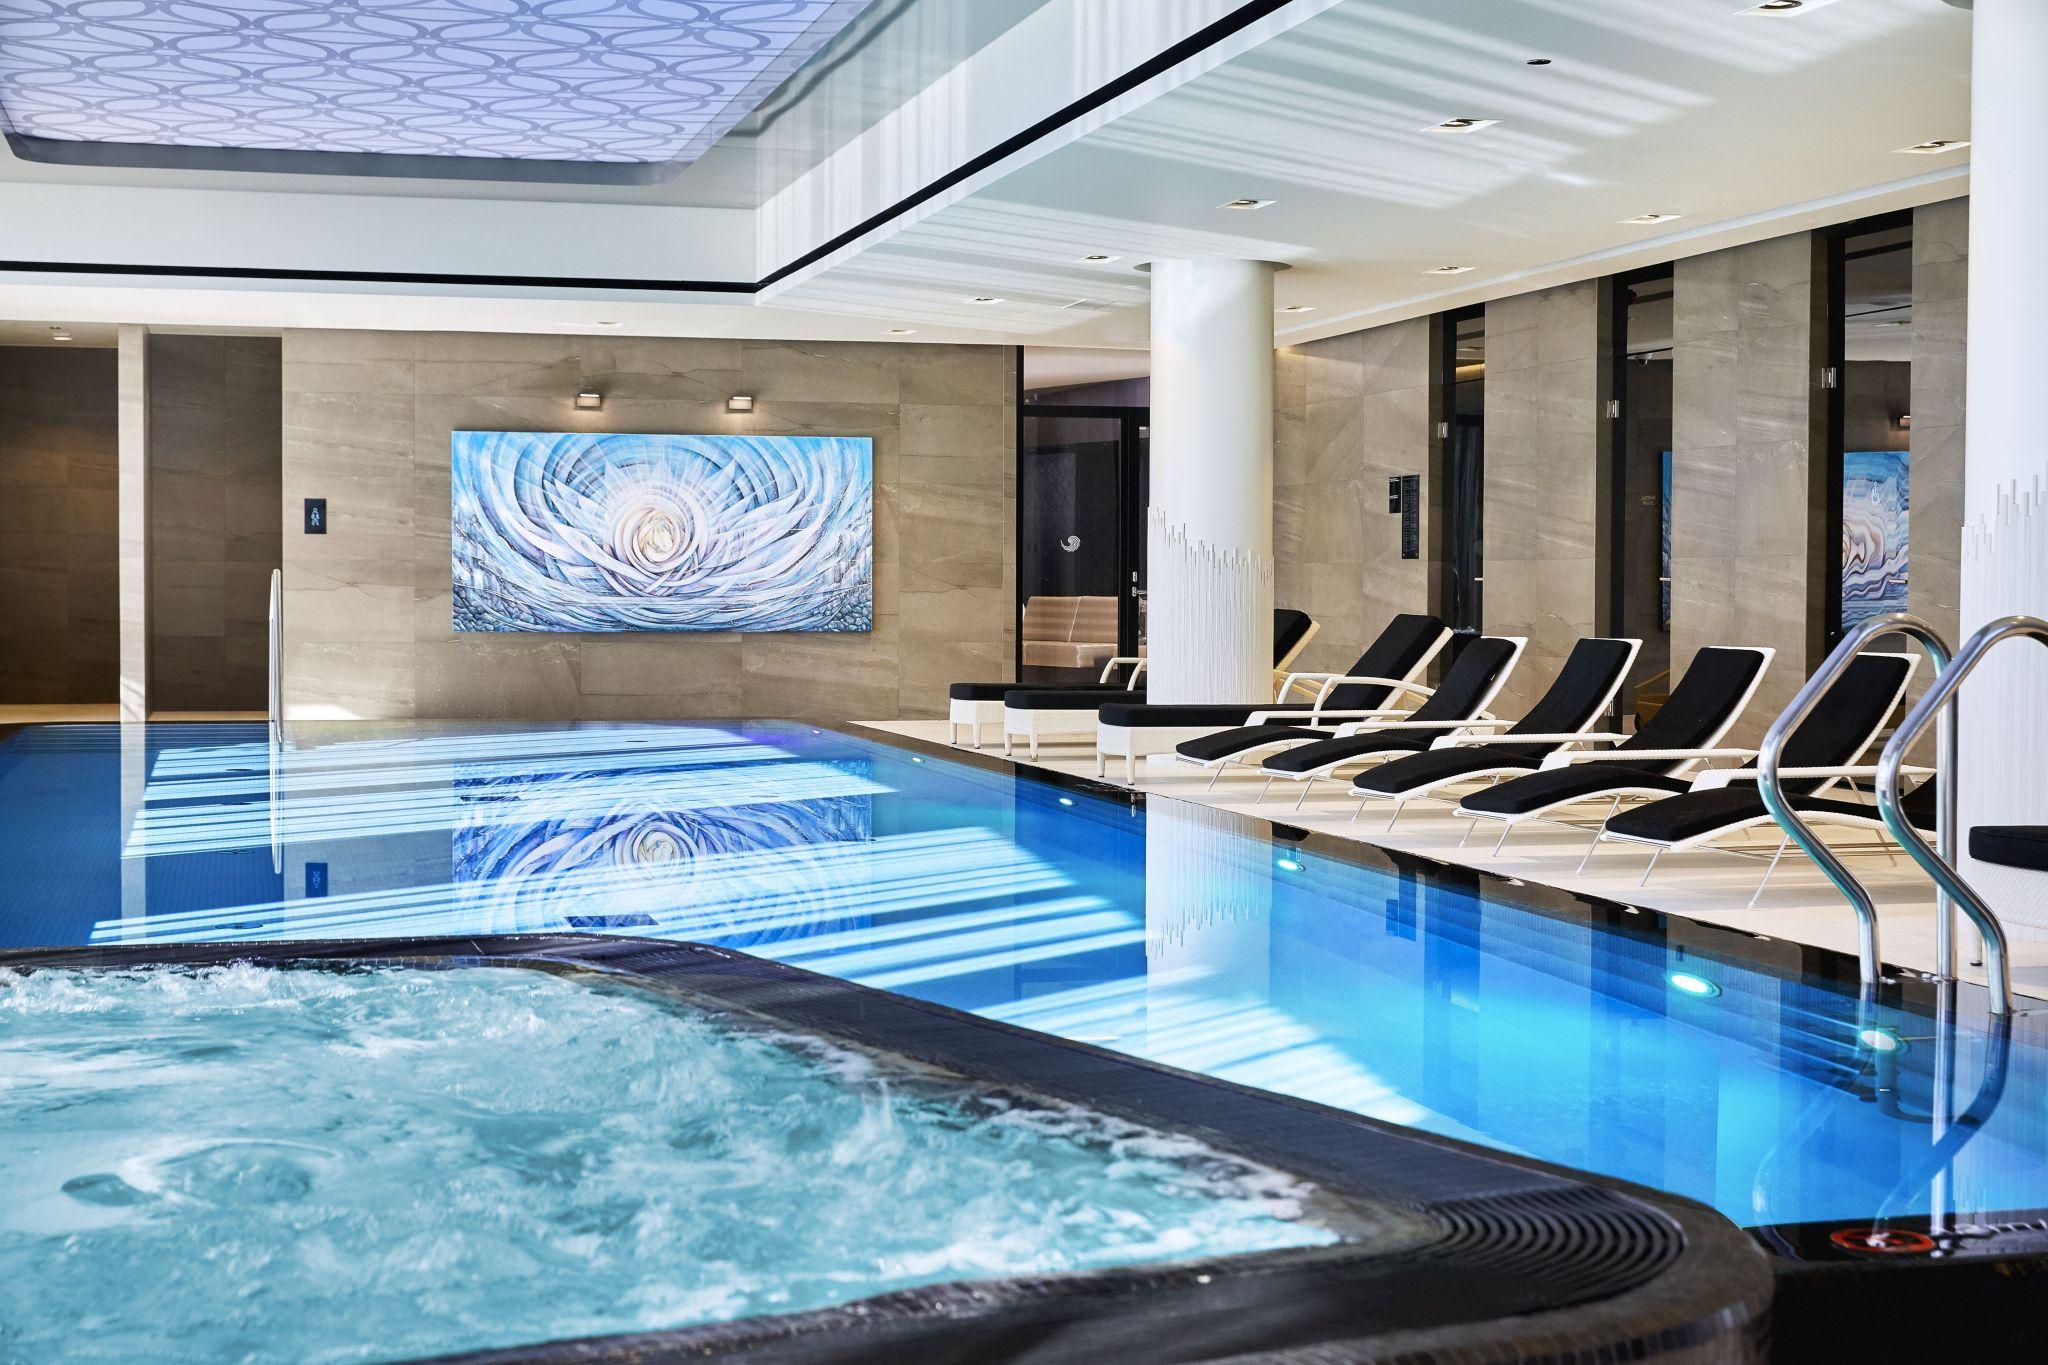 Hilton Tallinn Park hotelli spaa pälvis maineka auhinna